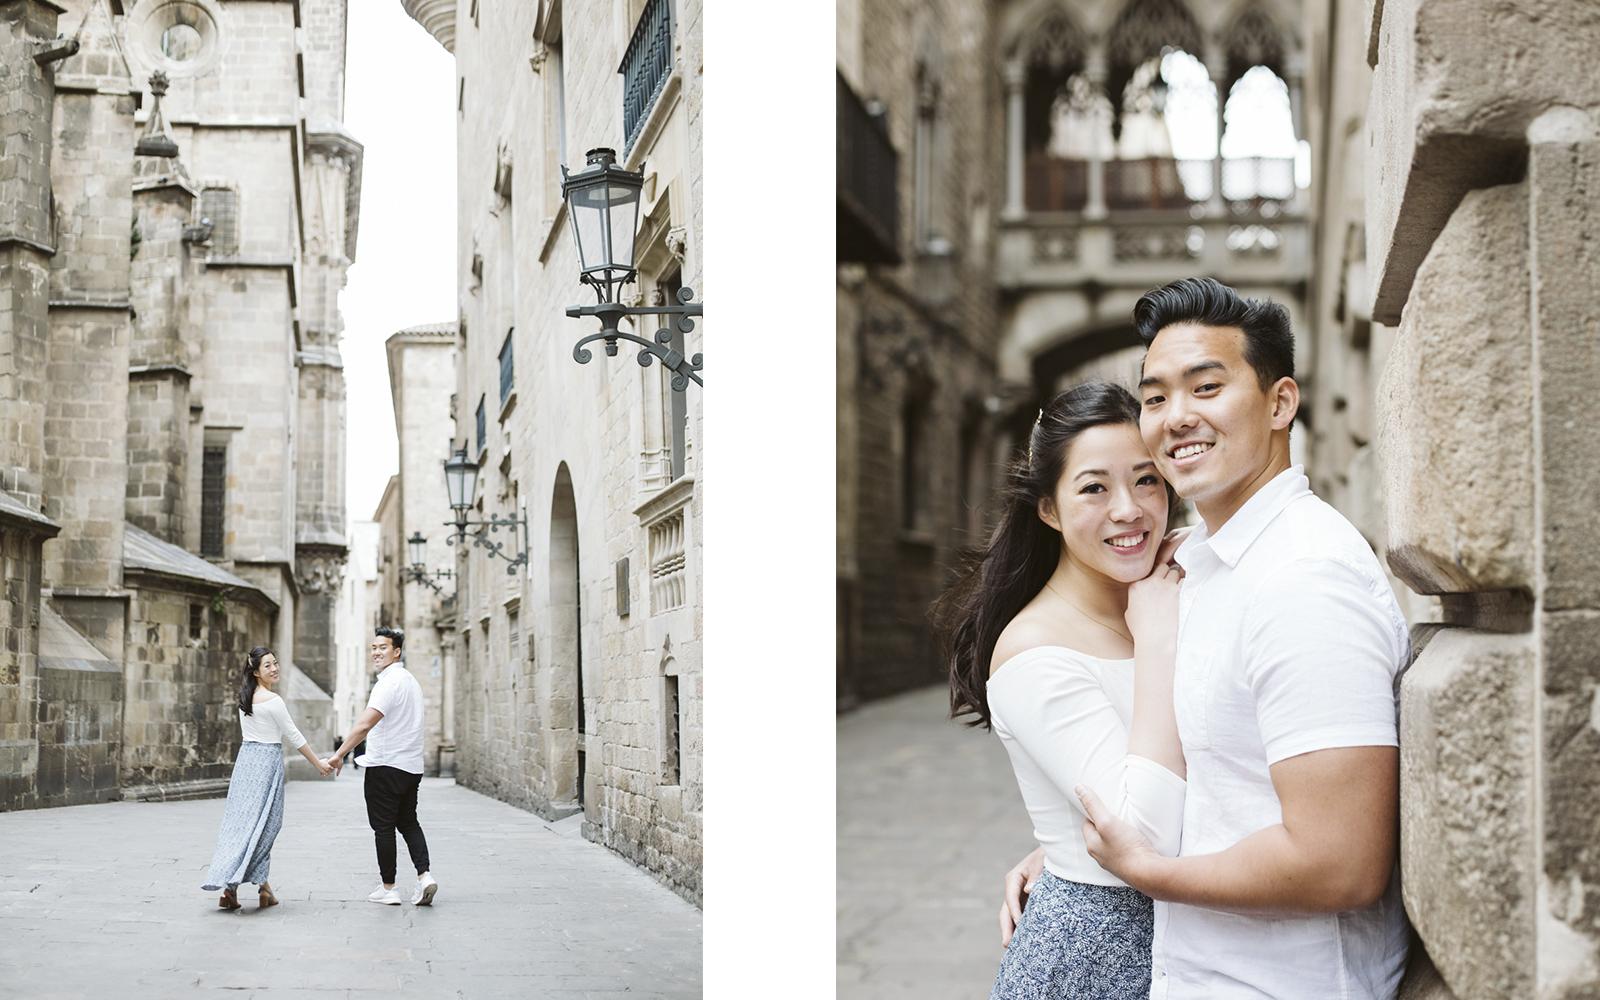 Engagement photo session in Gotico Barcelona   Natalia Photography